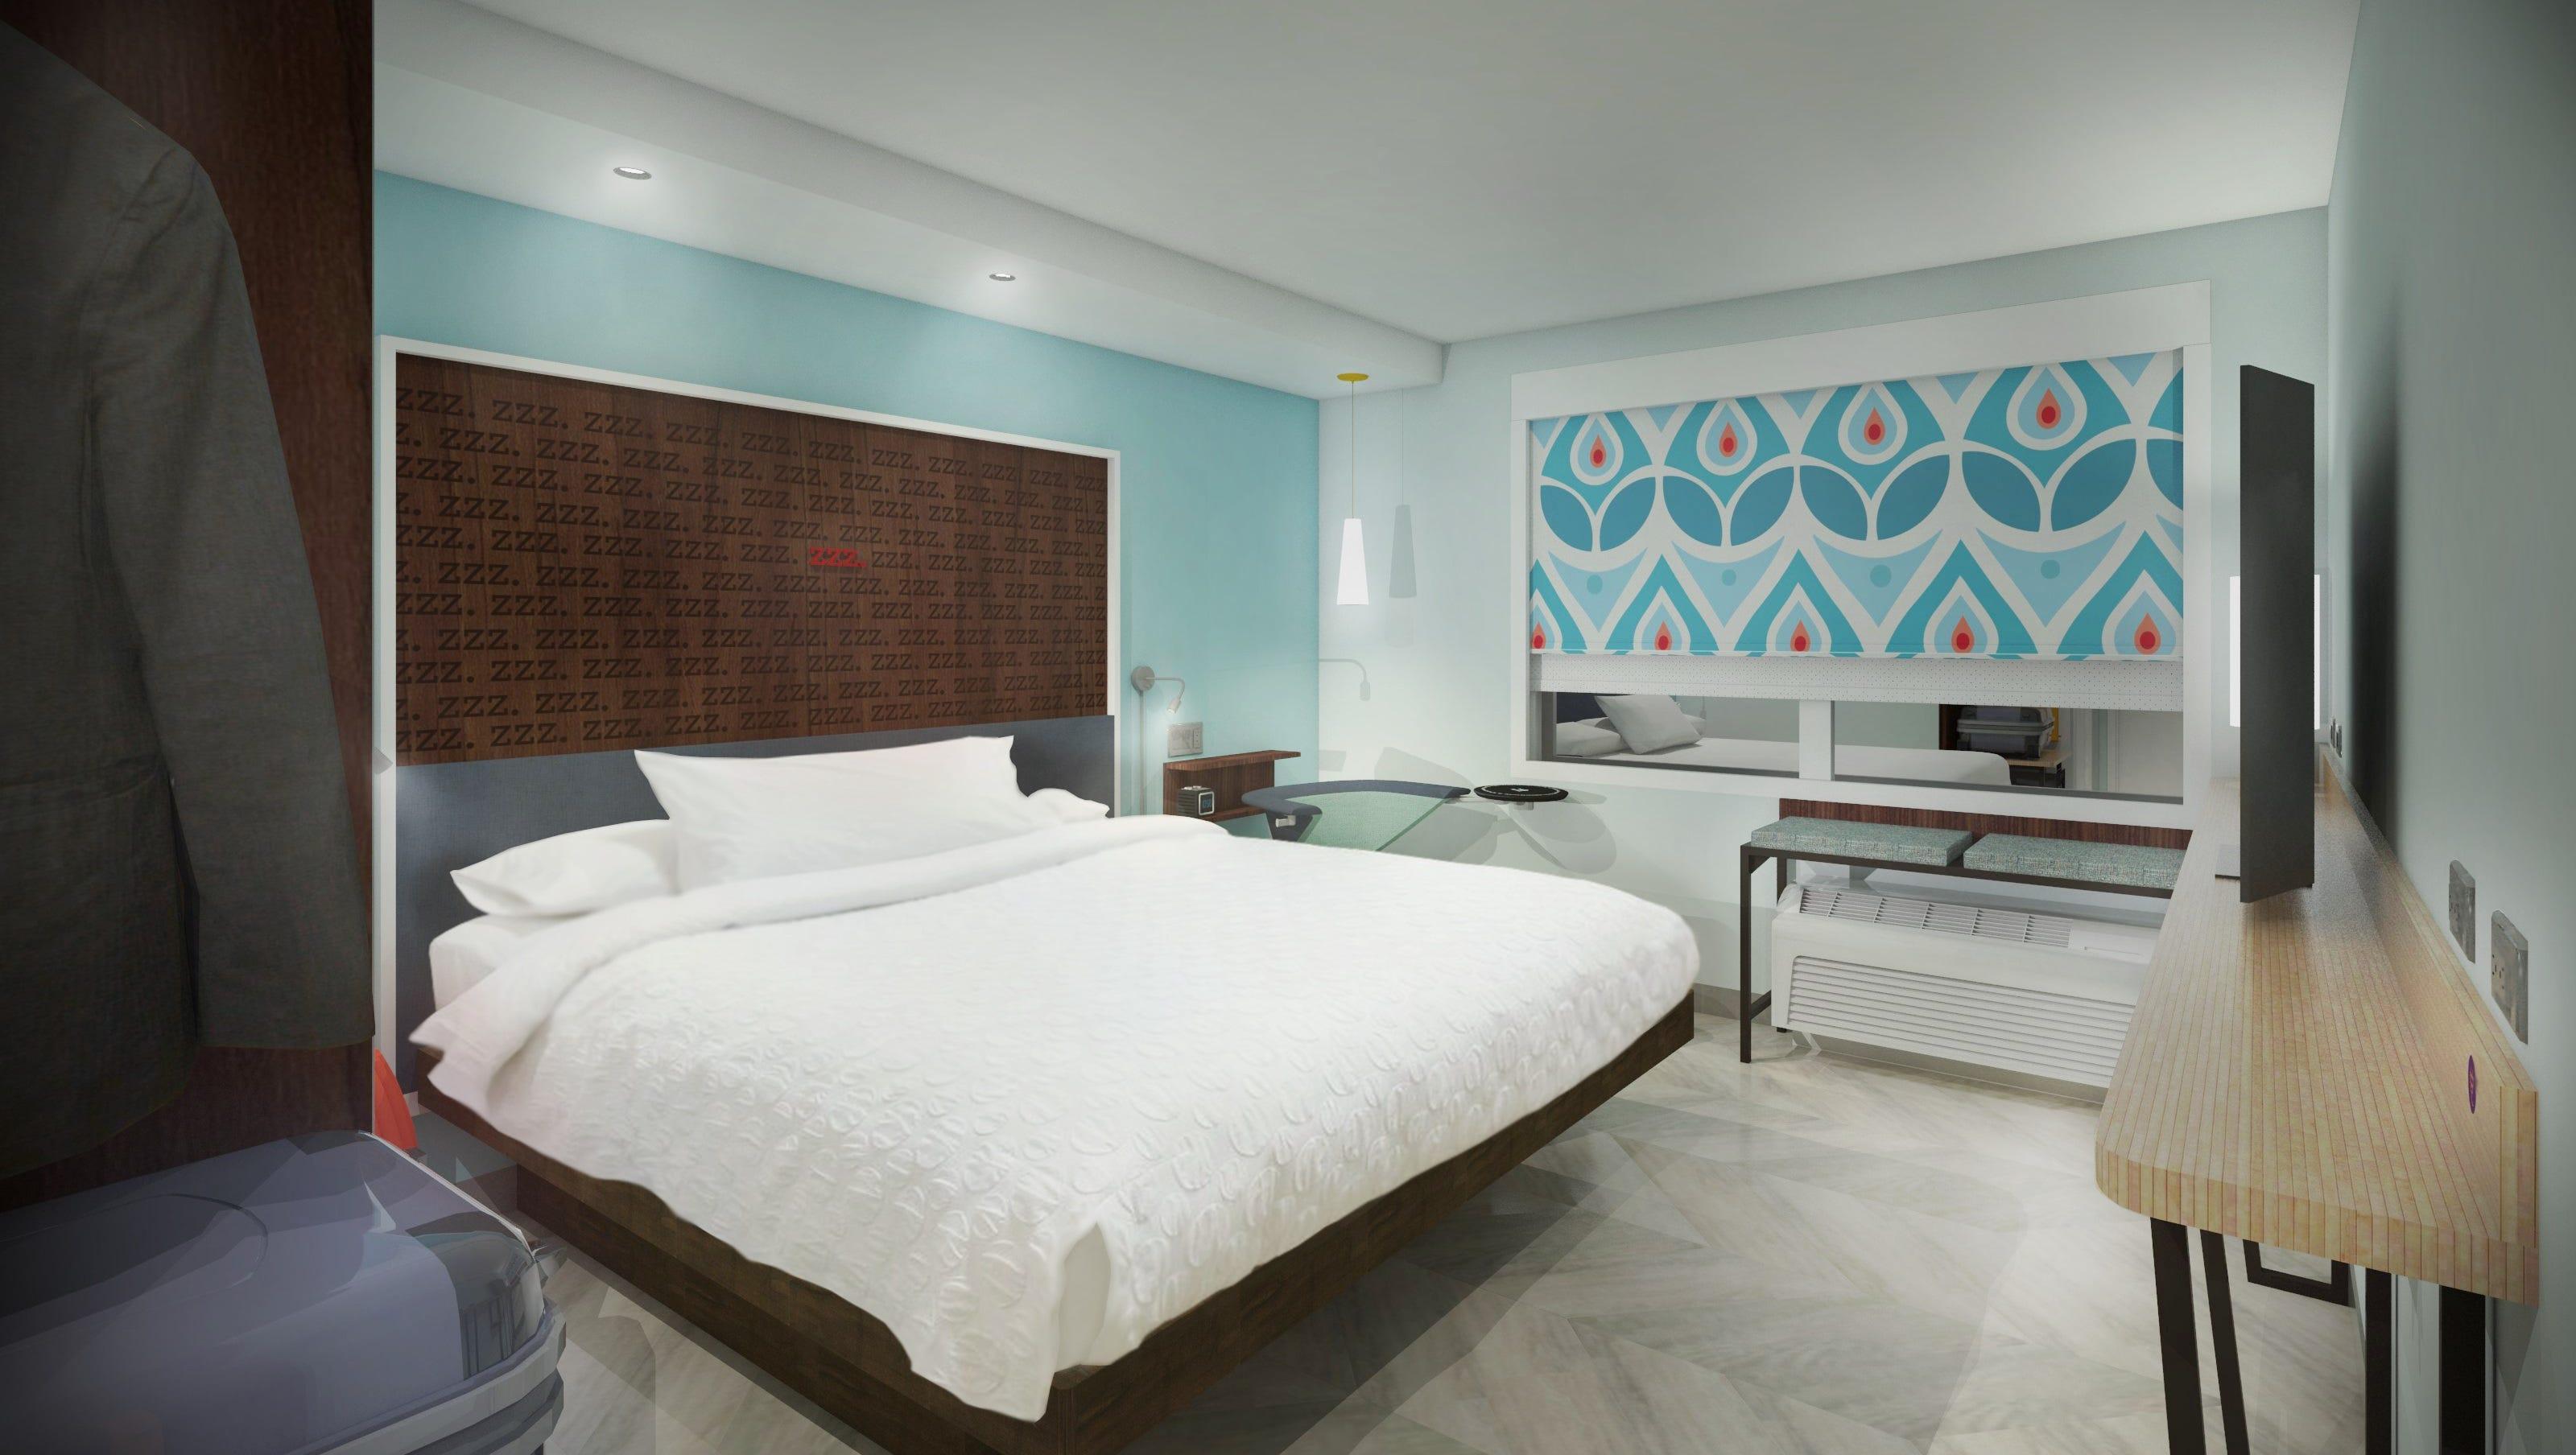 Hilton announces new affordable hotel brand, Tru